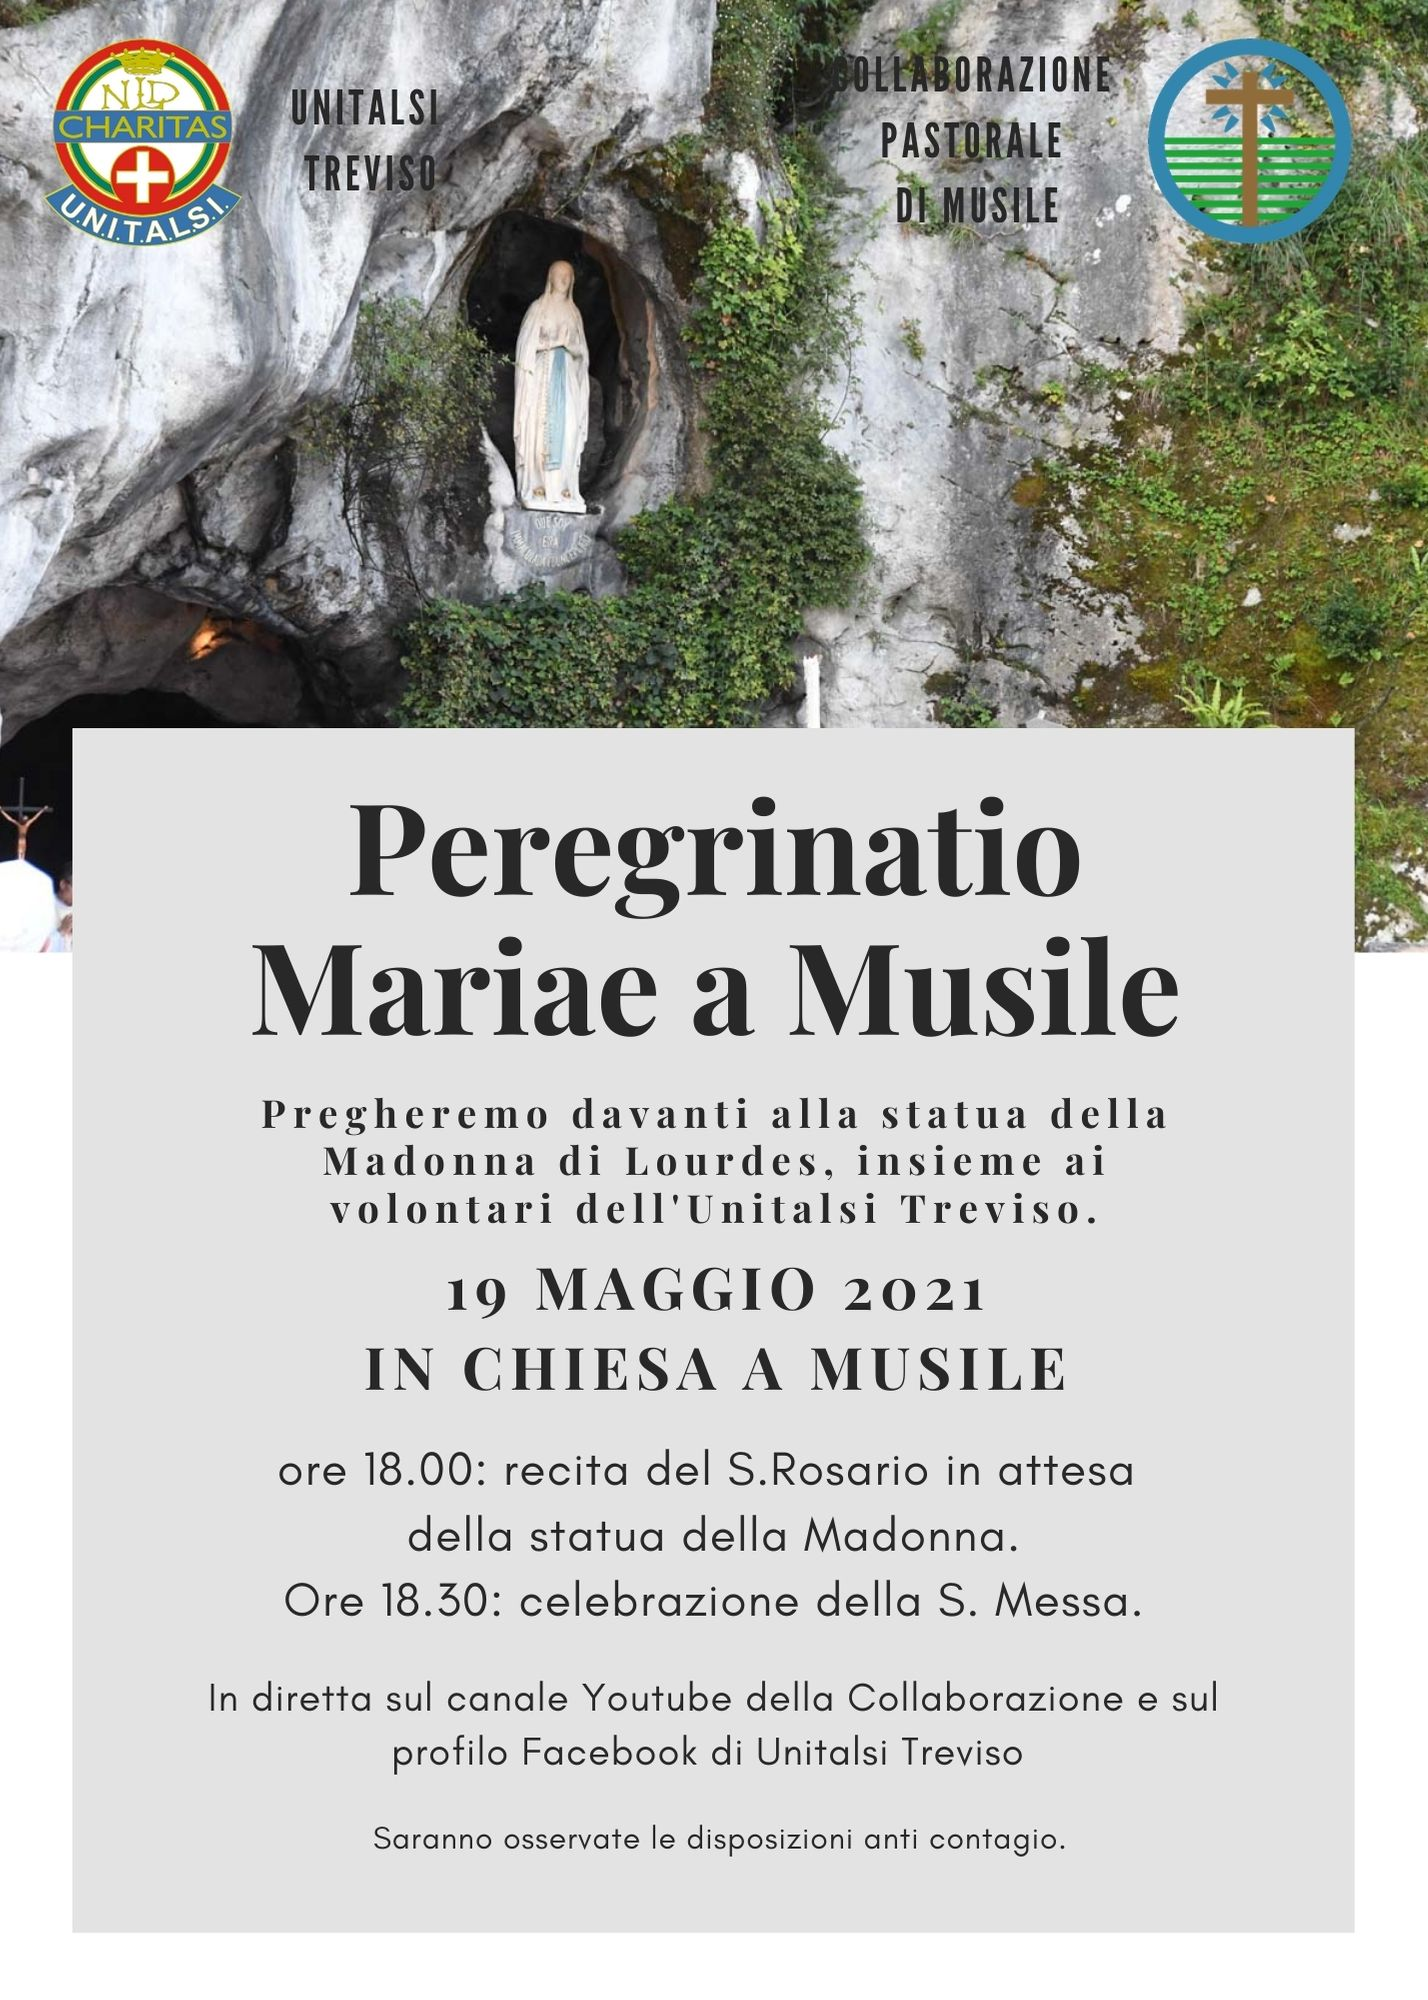 Peregrinatio Mariae a Musile